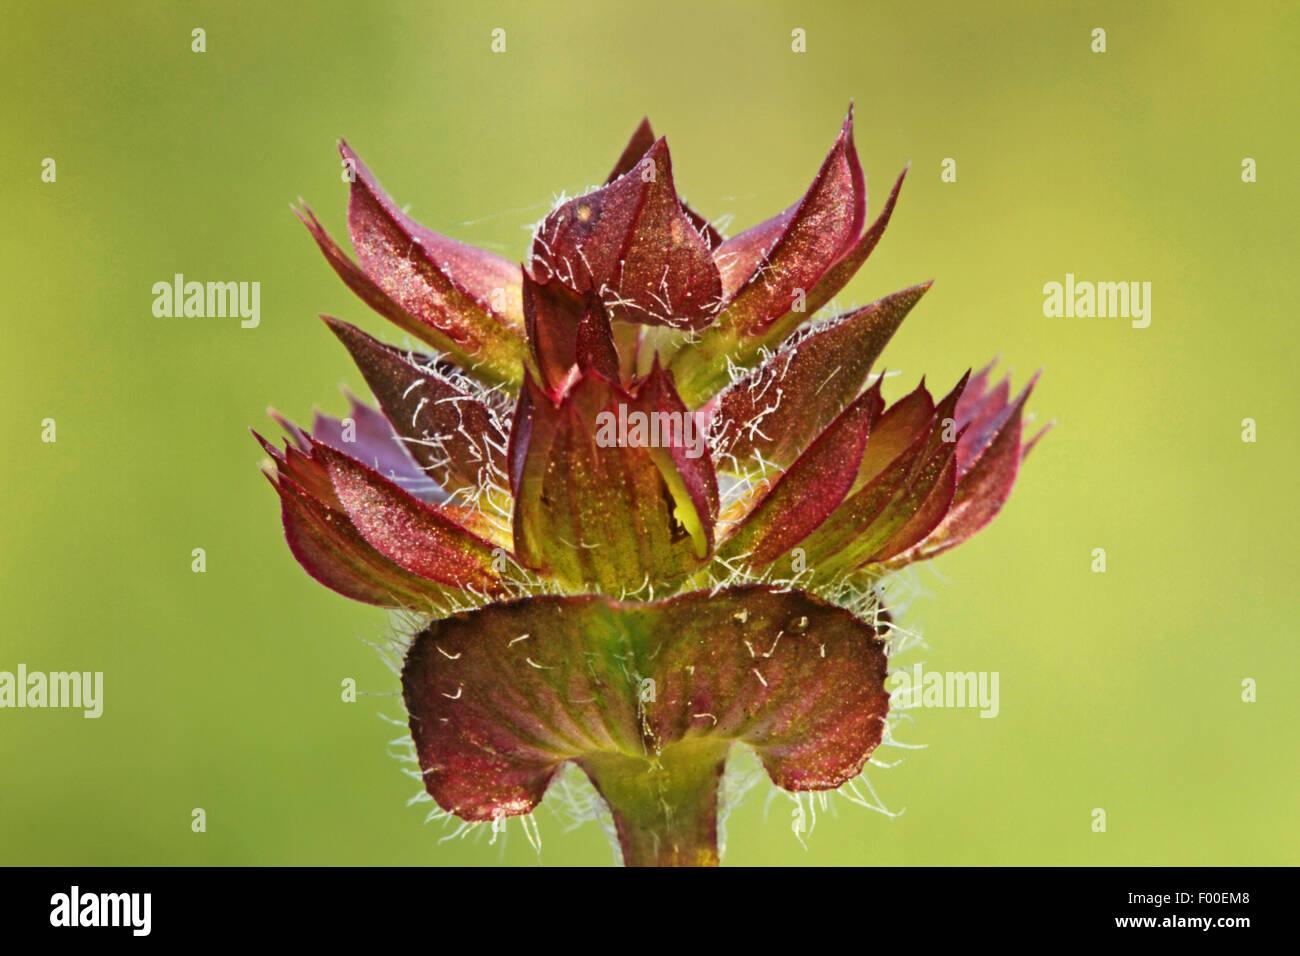 Large self-heal, Prunella loveliness (Prunella grandiflora), blooming, Germany - Stock Image